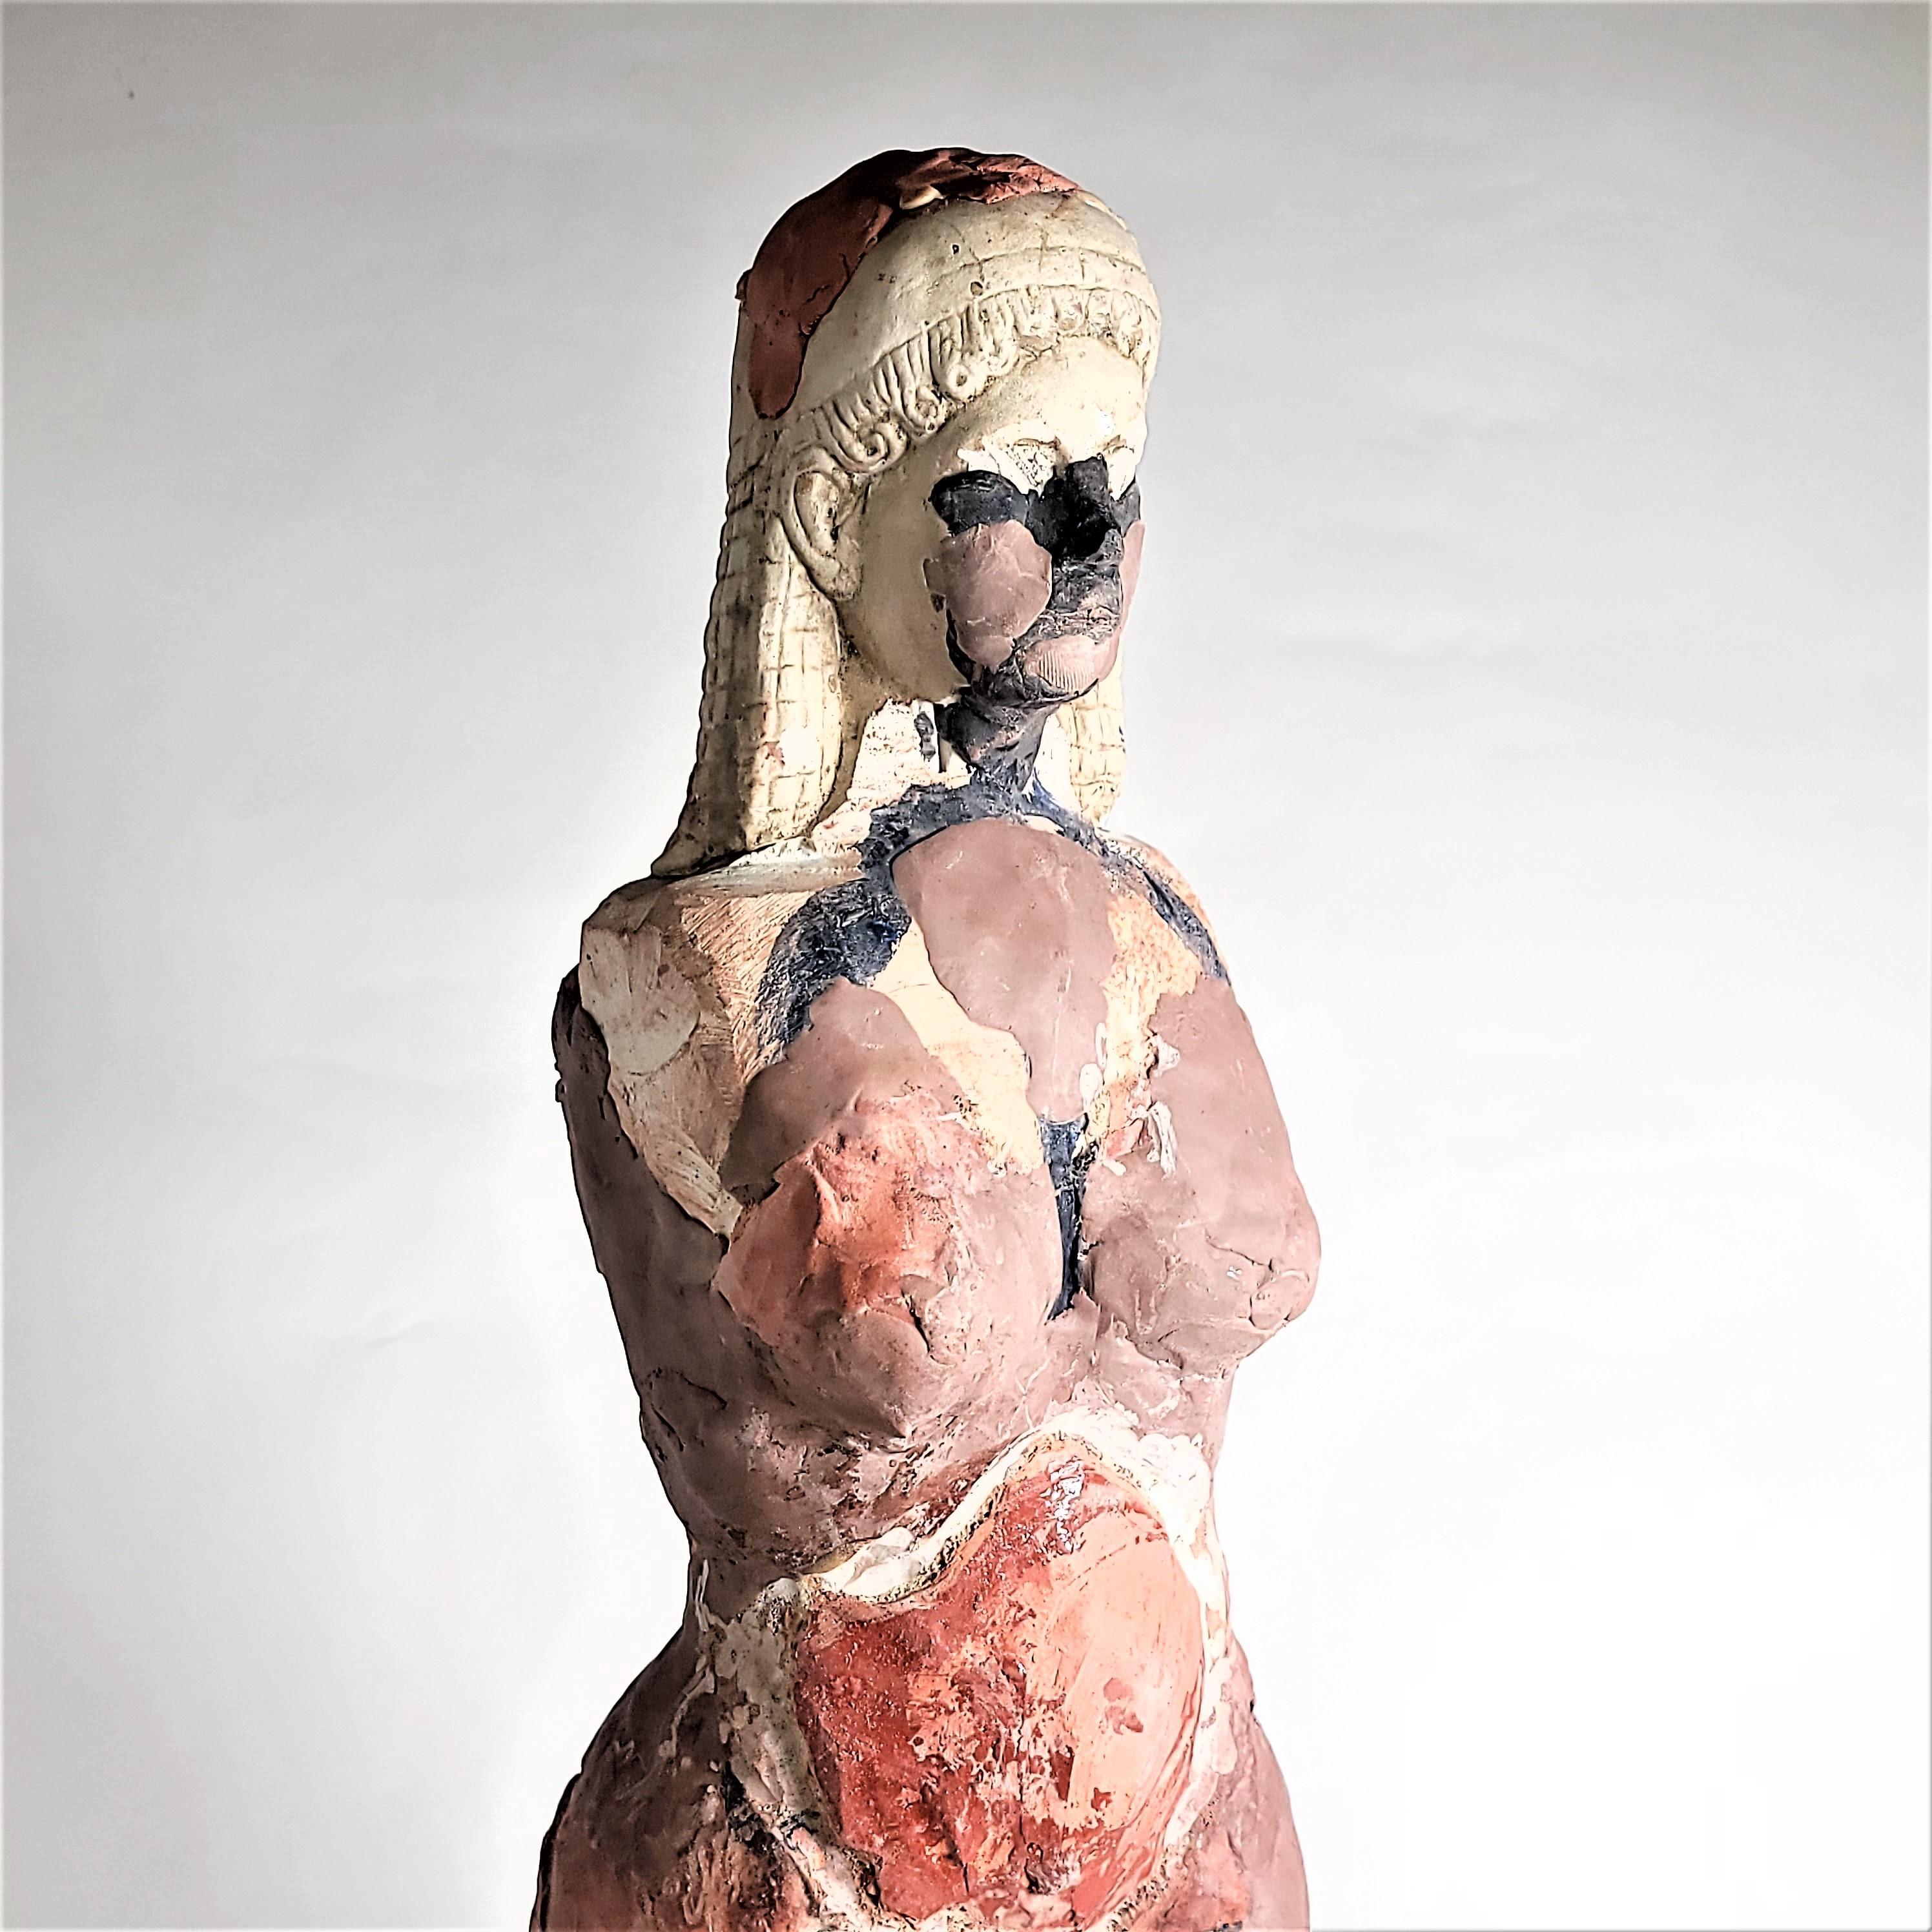 """Kore of 1821"" Medium Nude Figurative Sculpture, Orange, Brown, White"